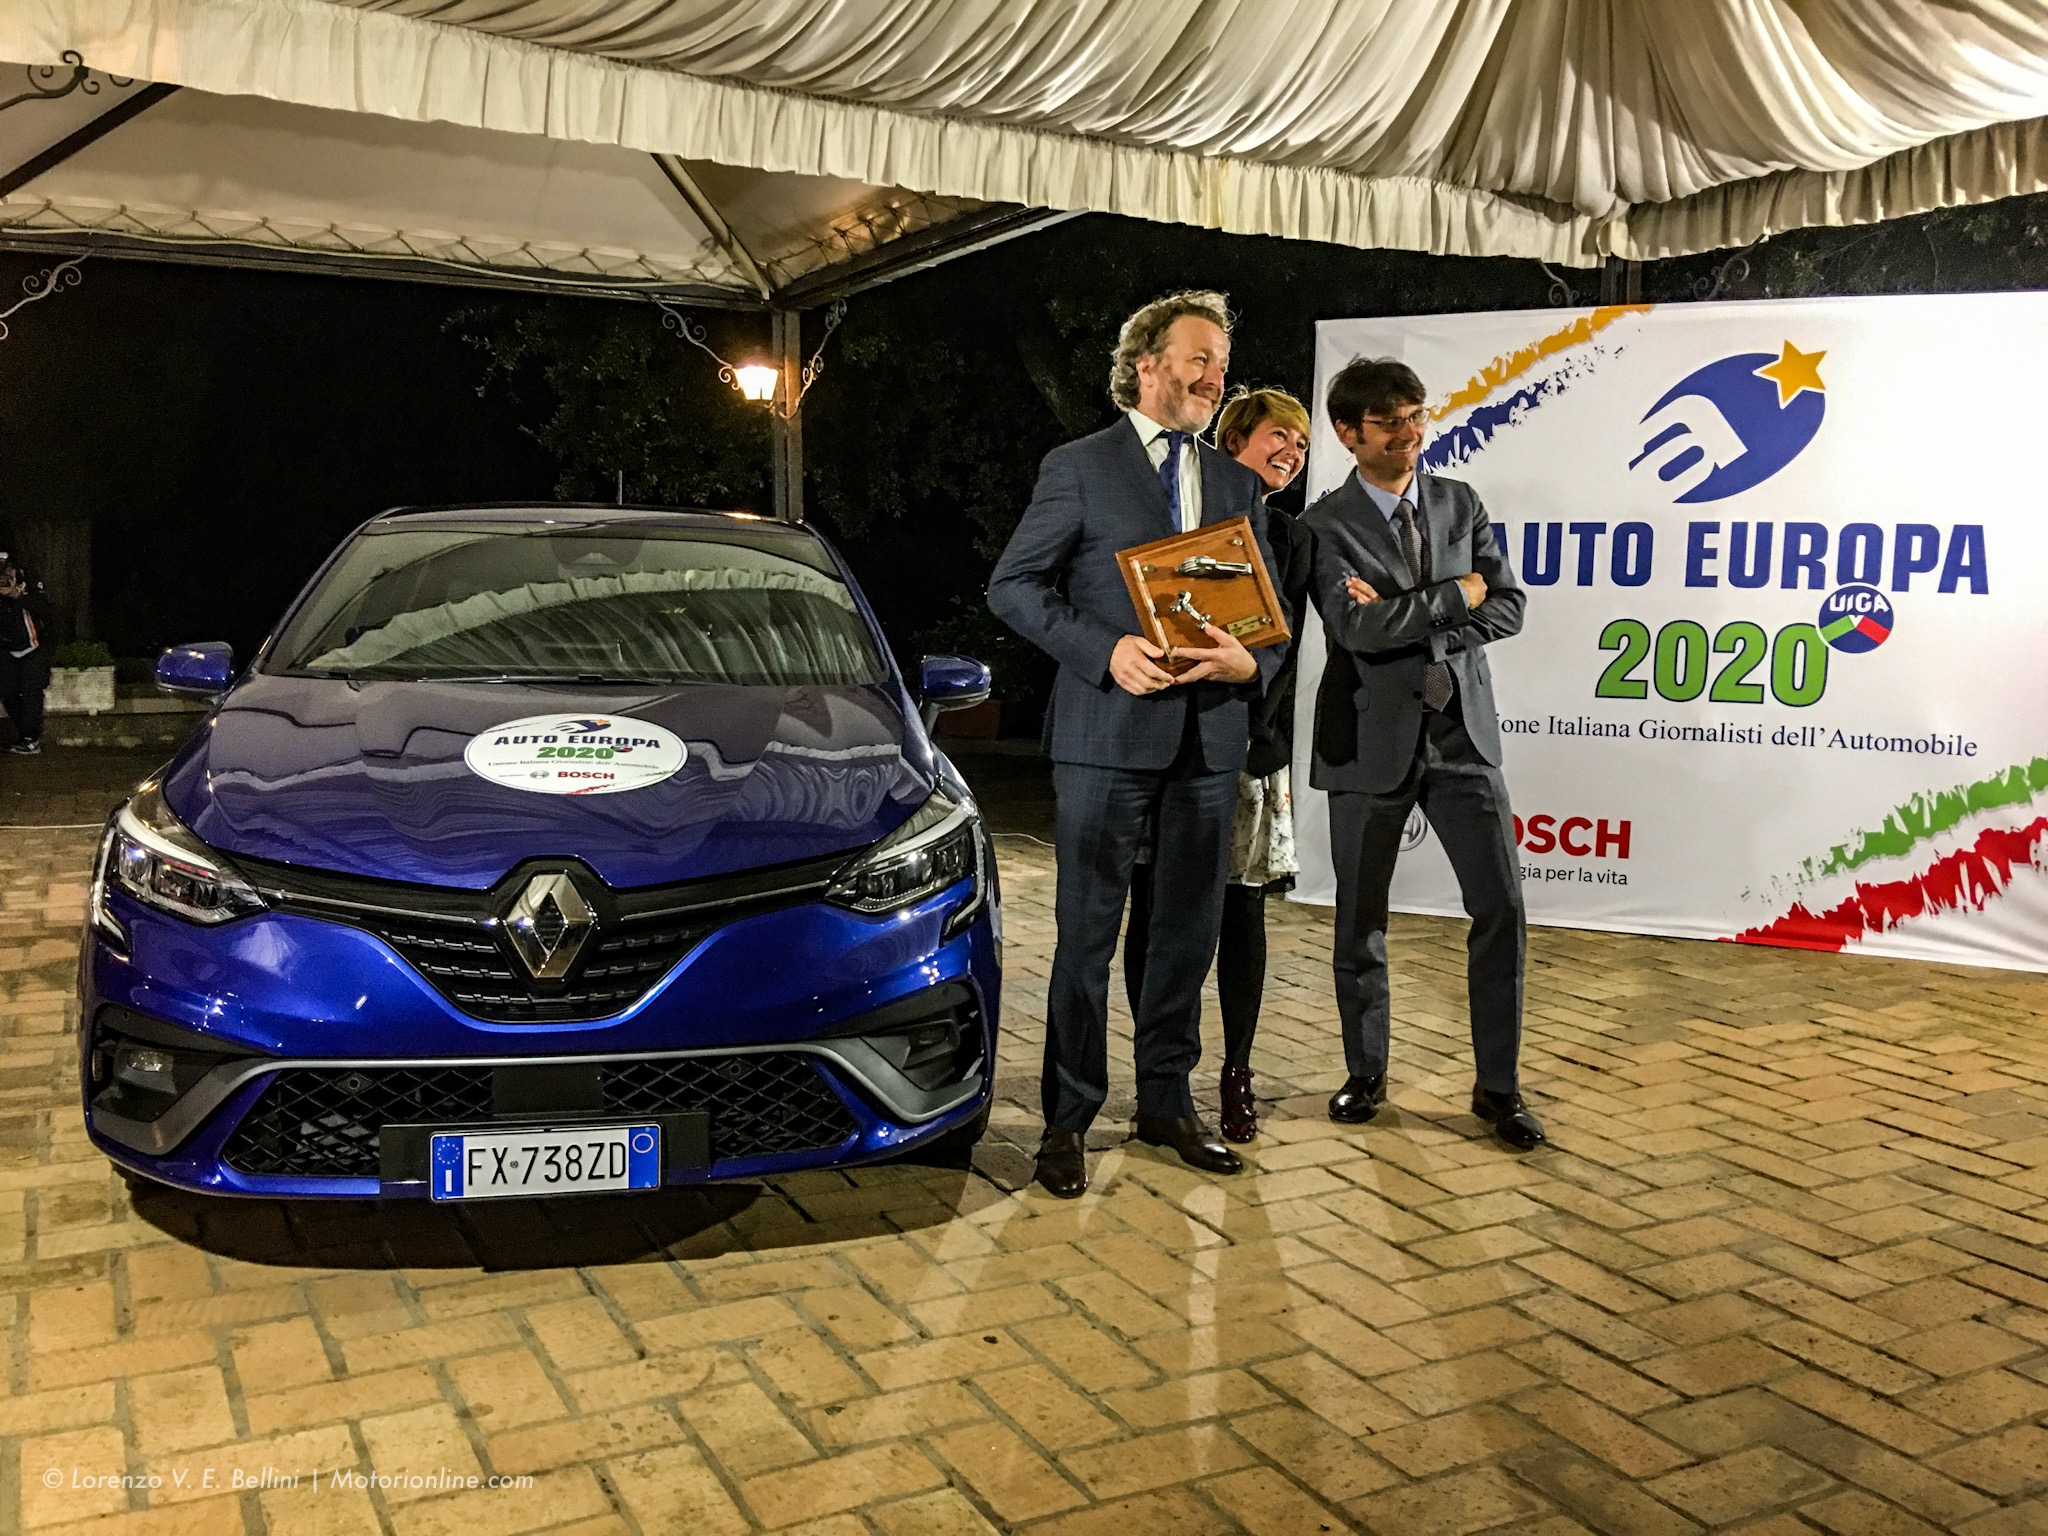 Auto Europa 2020